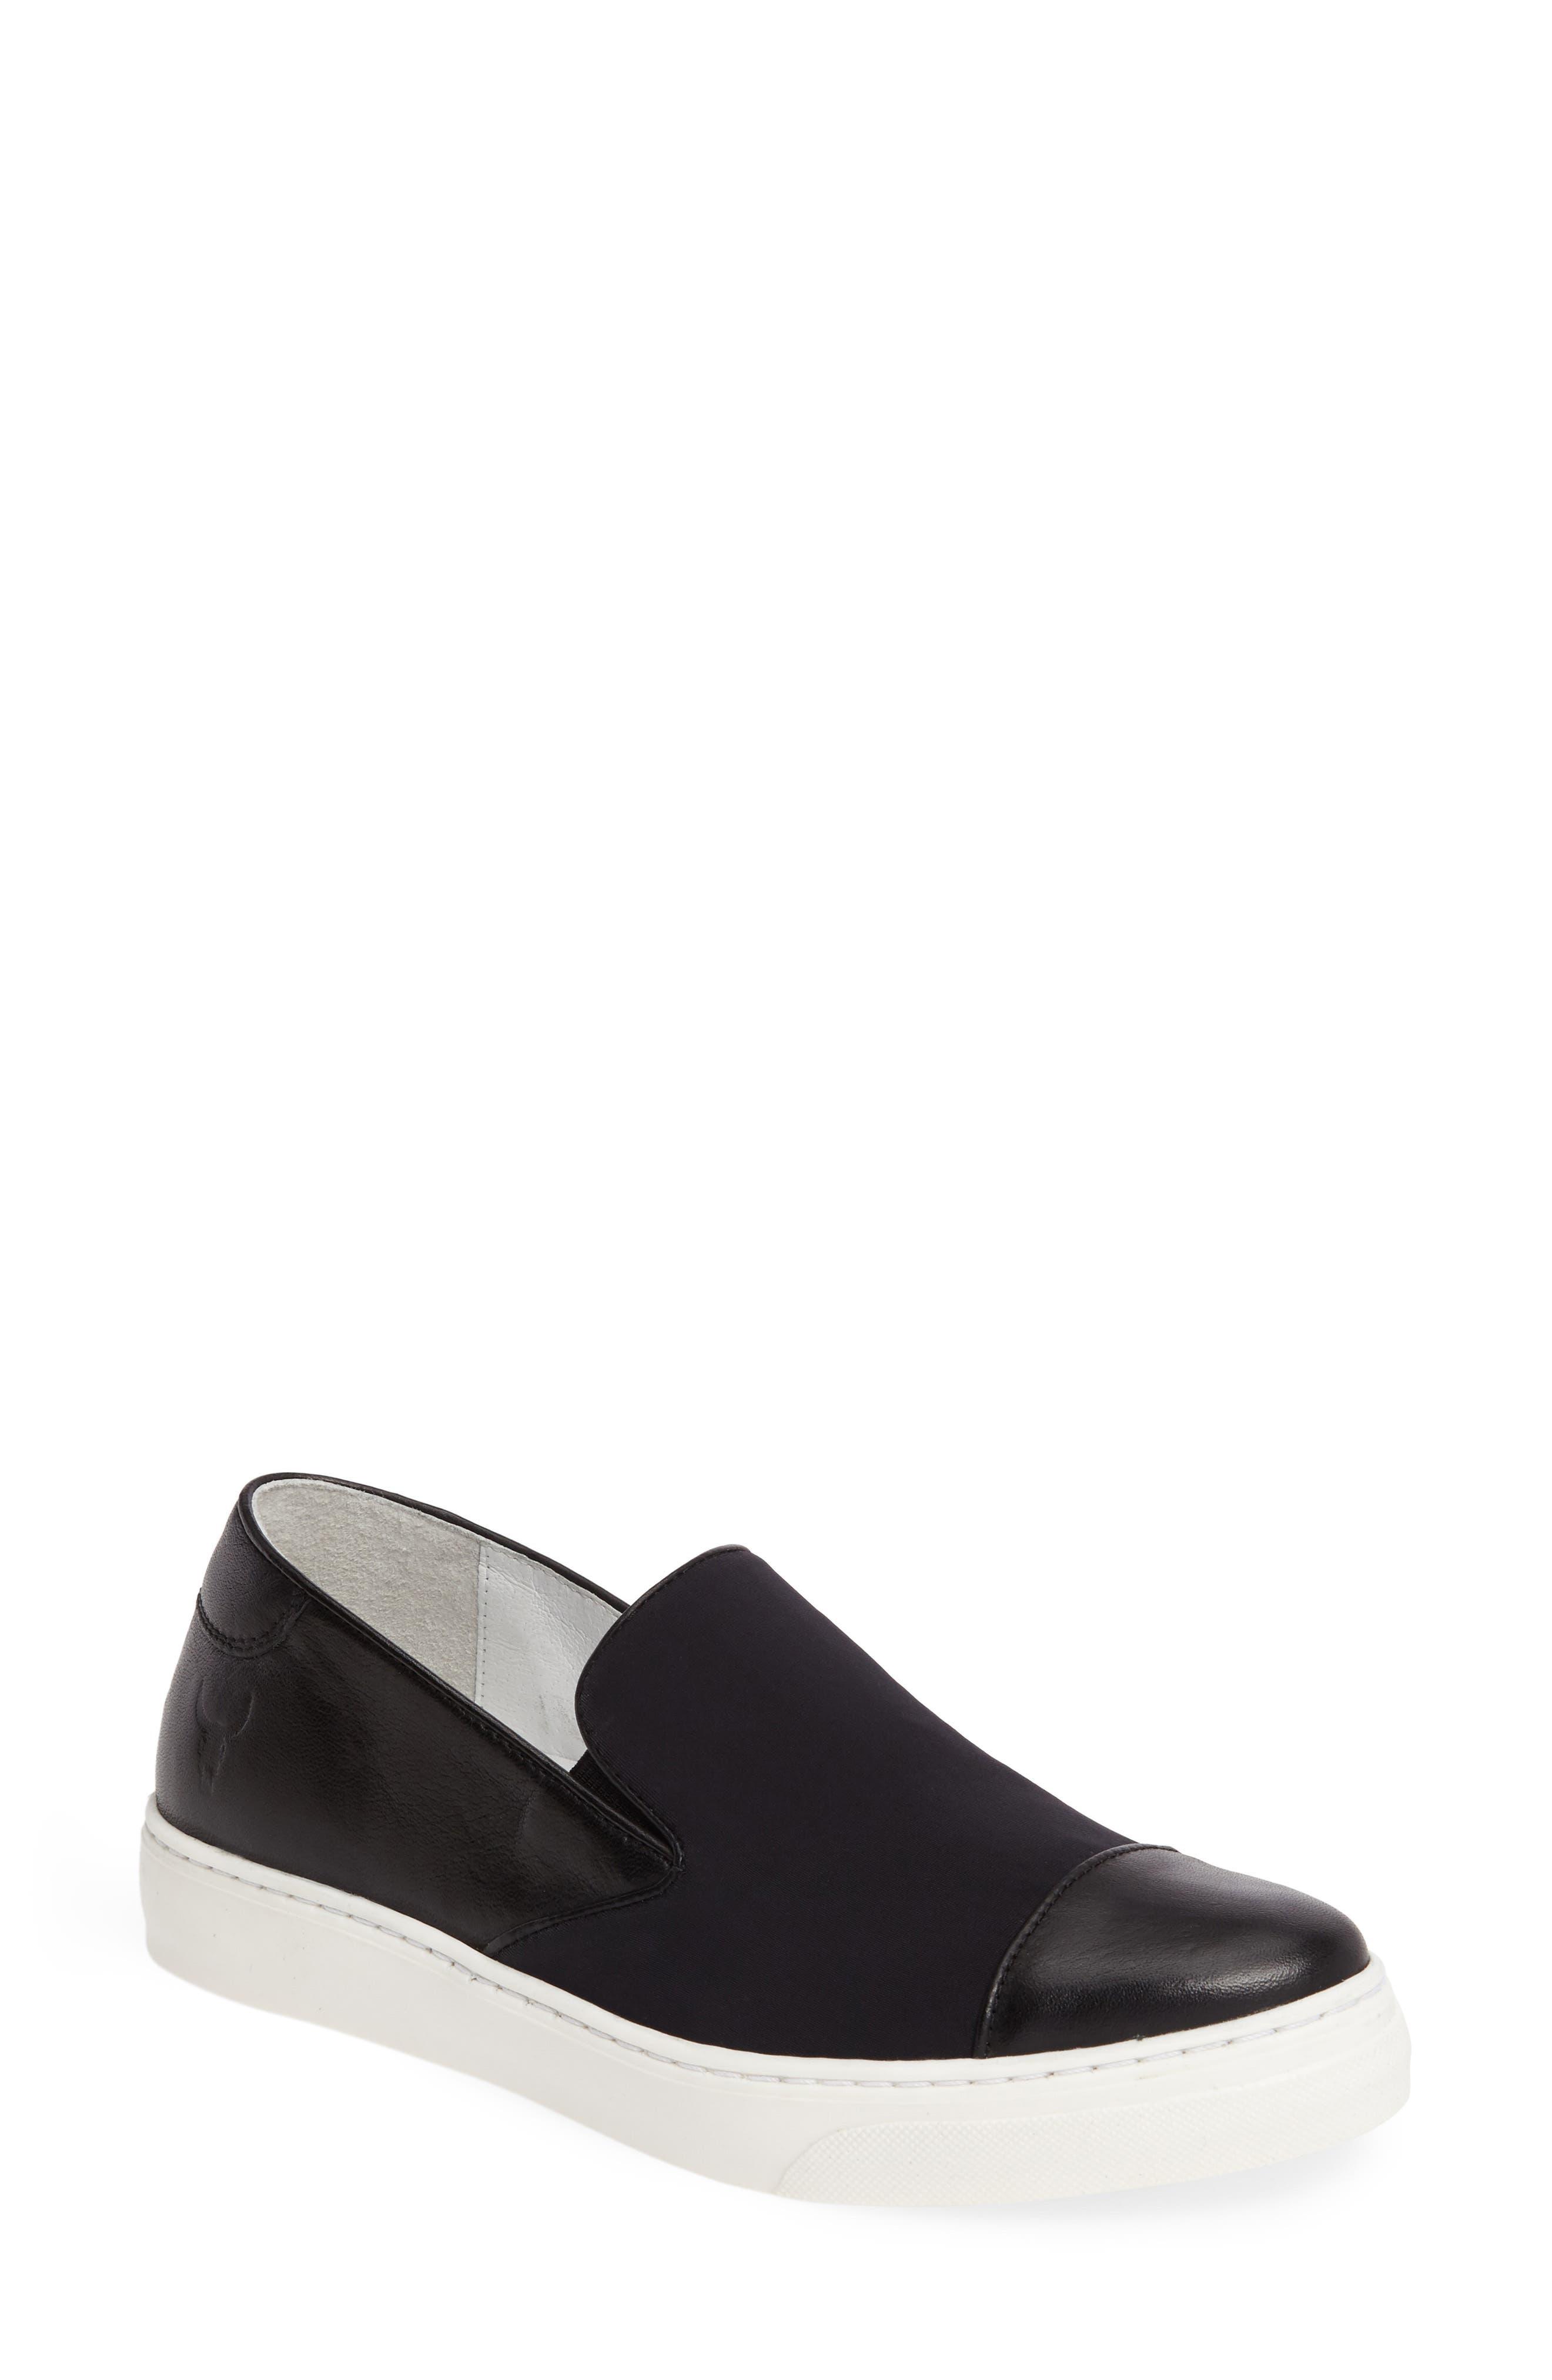 Betsy Slip-On Sneaker,                             Main thumbnail 1, color,                             001